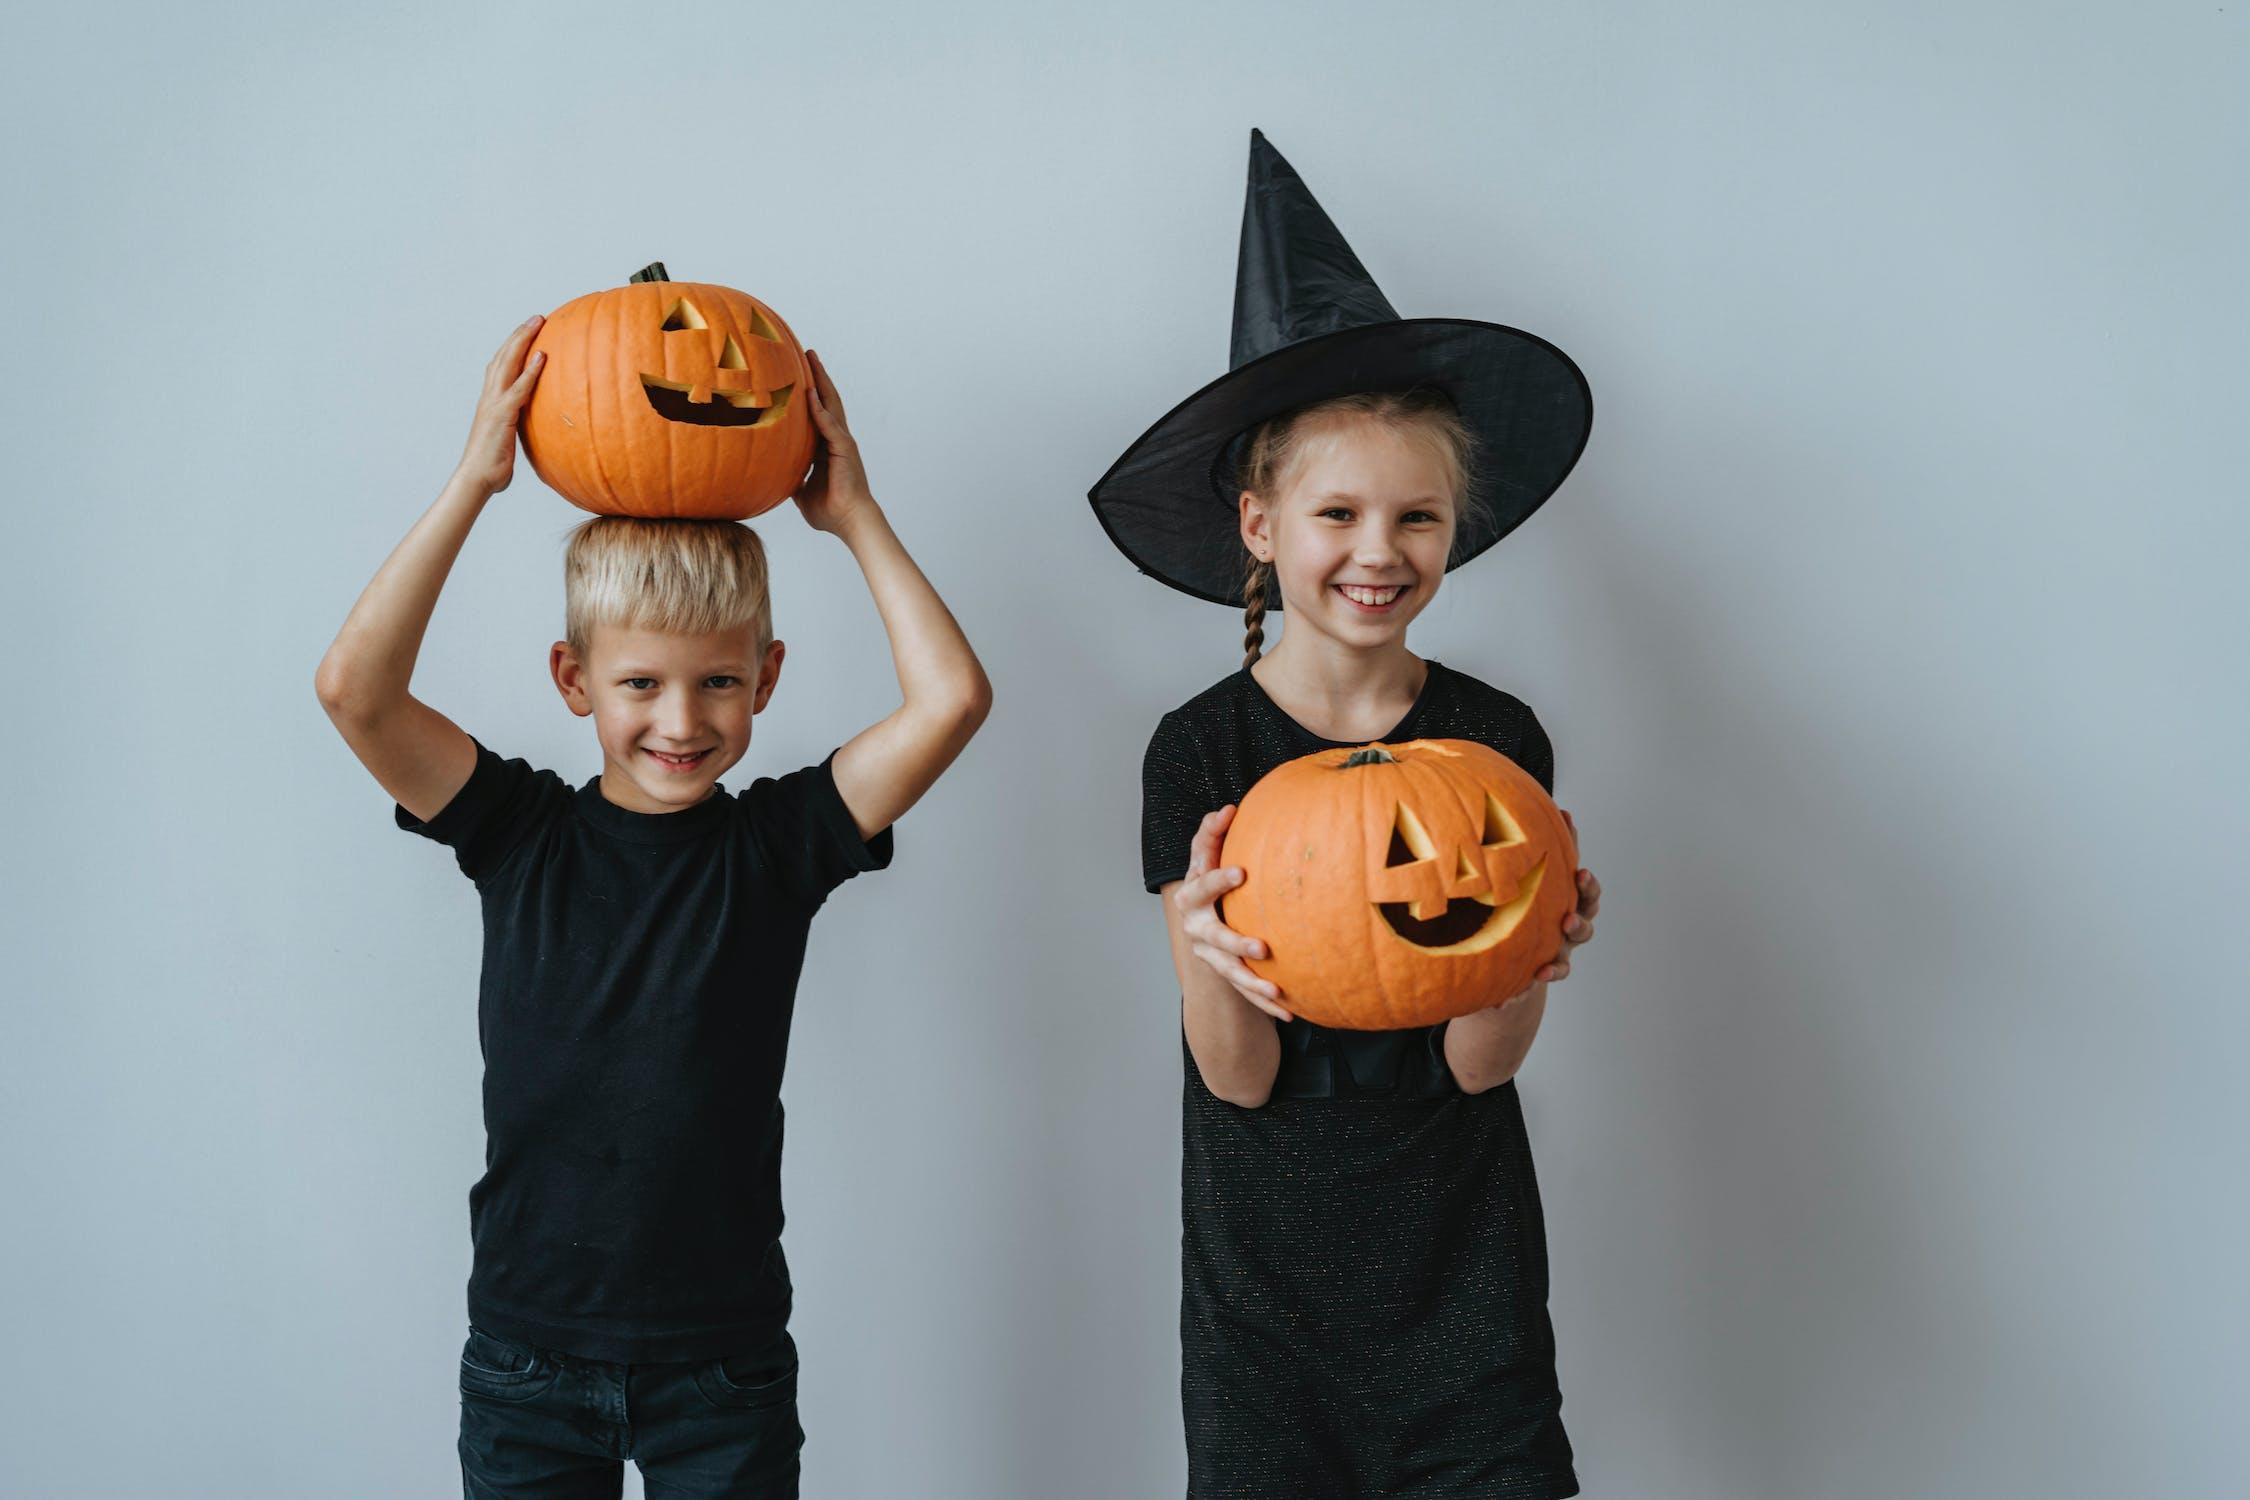 halloween 2020, thelashop